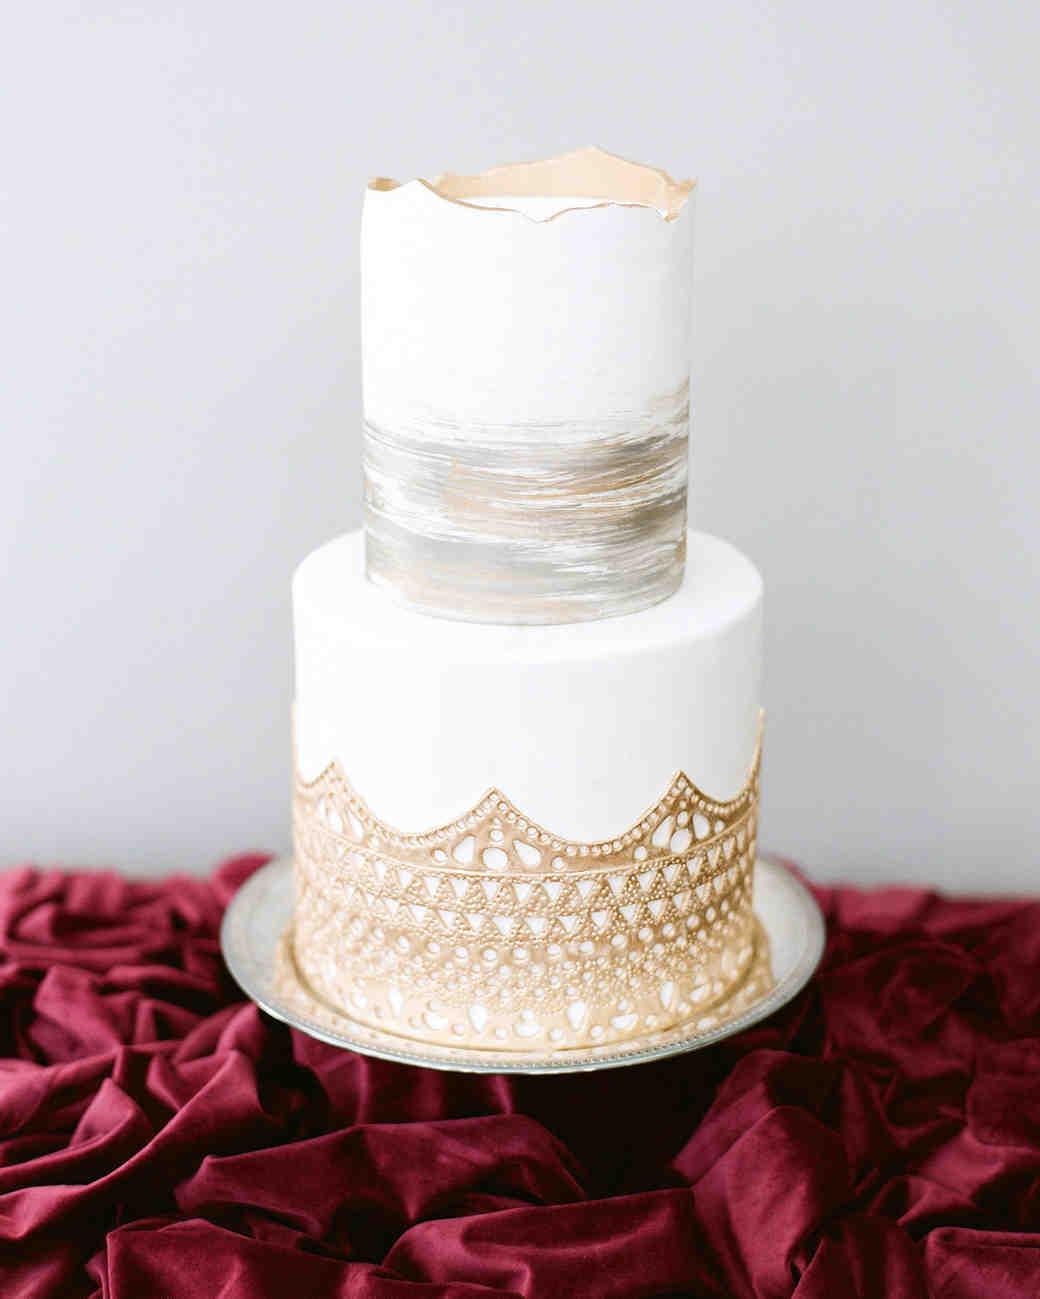 Winter Wedding Cake Designs